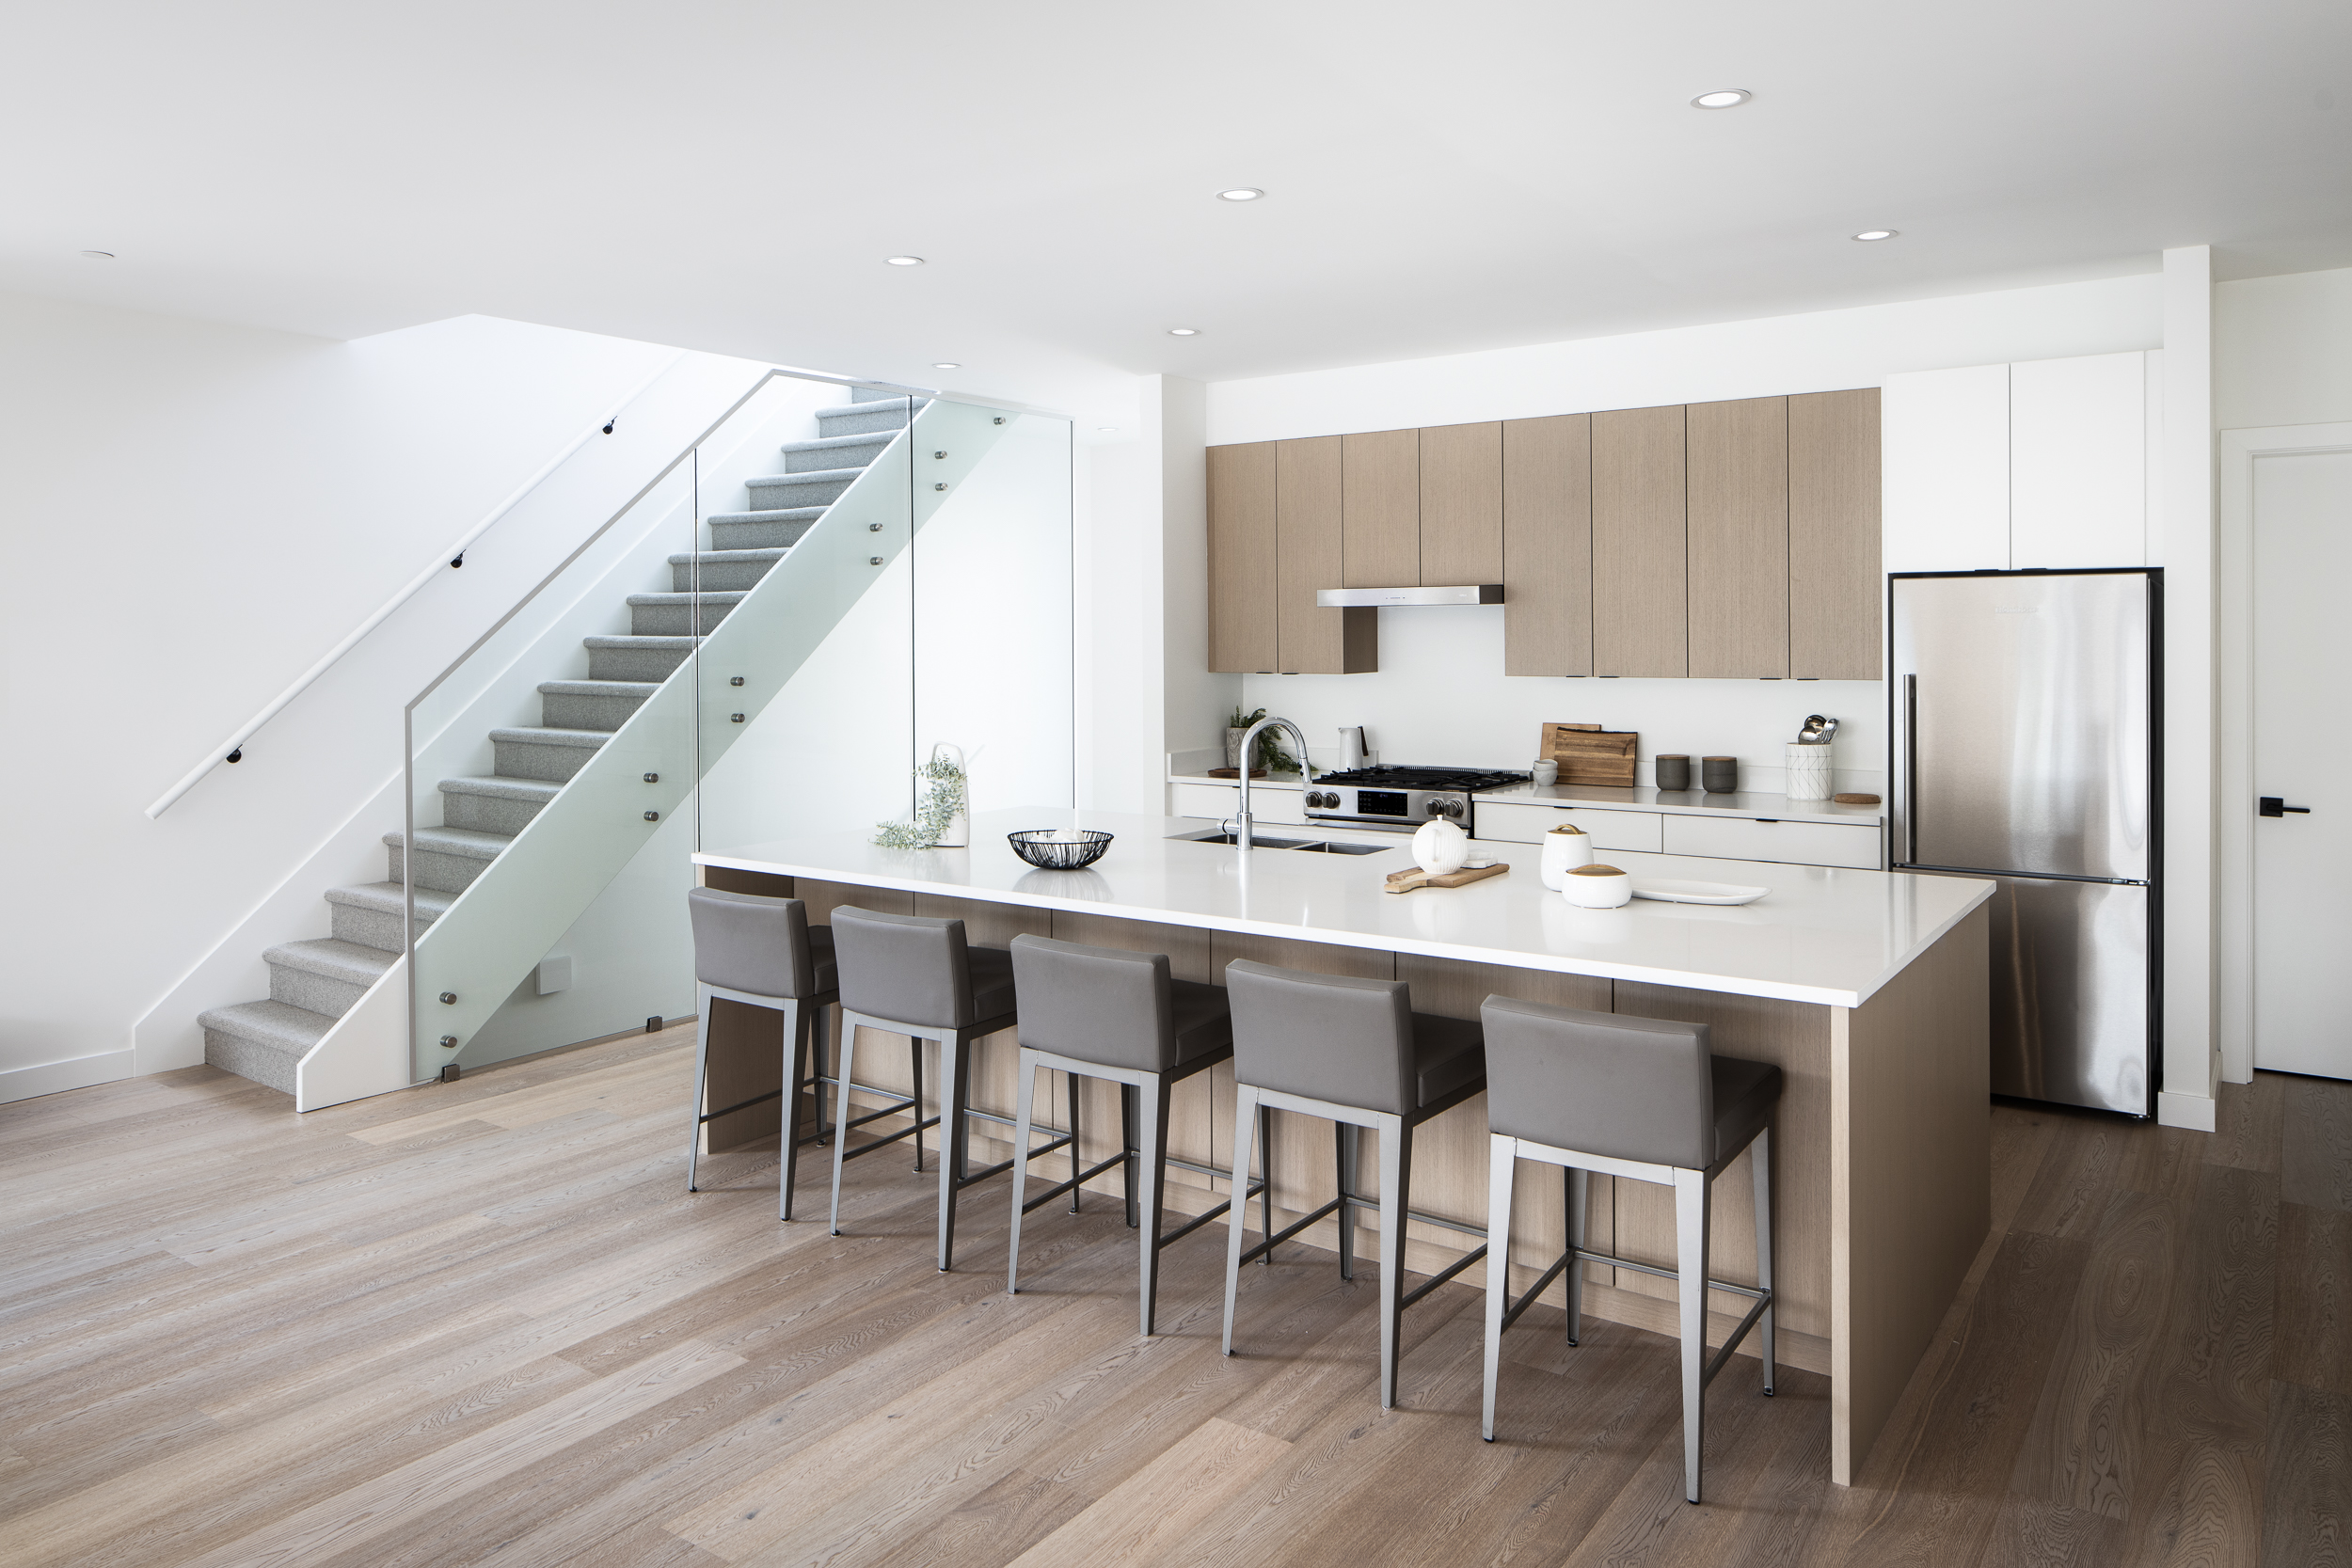 Squamish Interior Design Photography - Kitchen